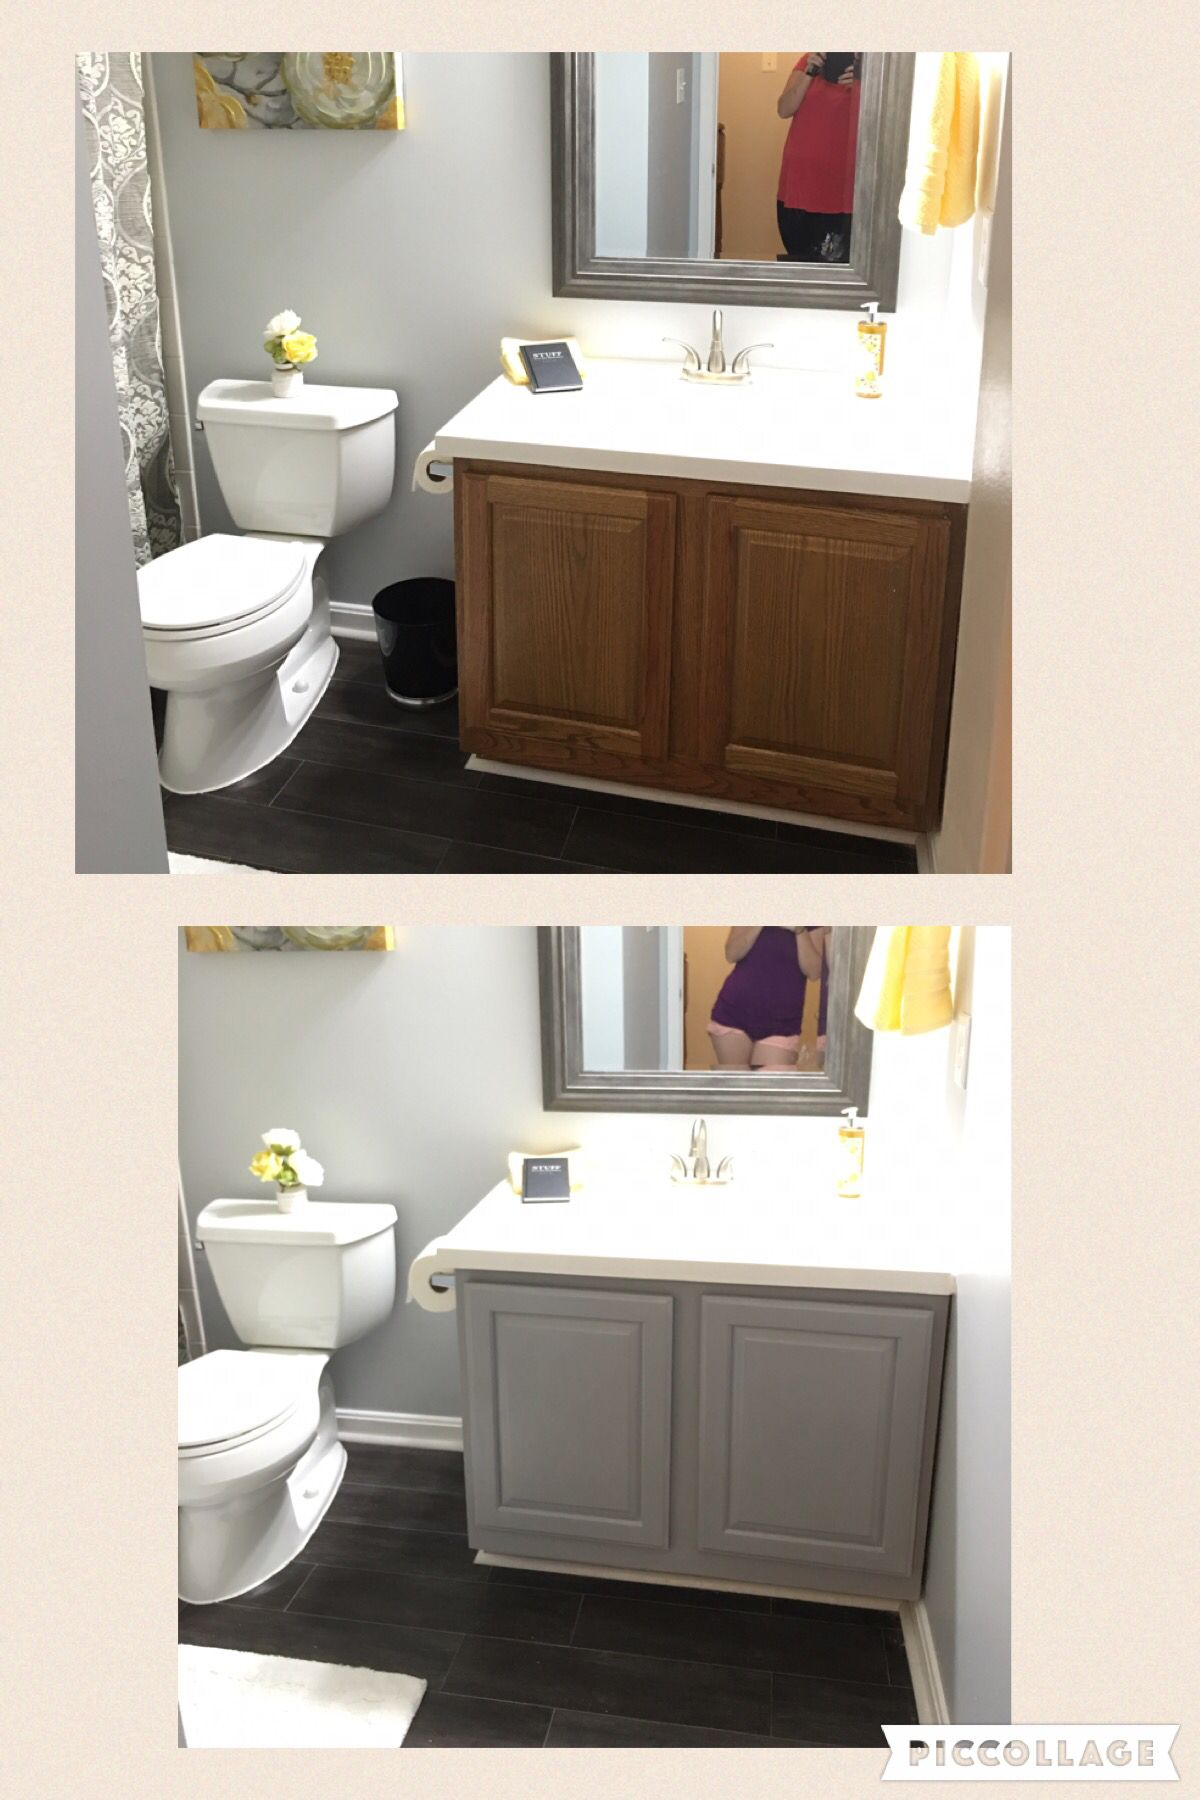 Before And After Bathroom Vanity With Annie Sloan Chalk Paint In Paris Grey Painted Vanity Bathroom Bathroom Vanity Redo Trendy Bathroom